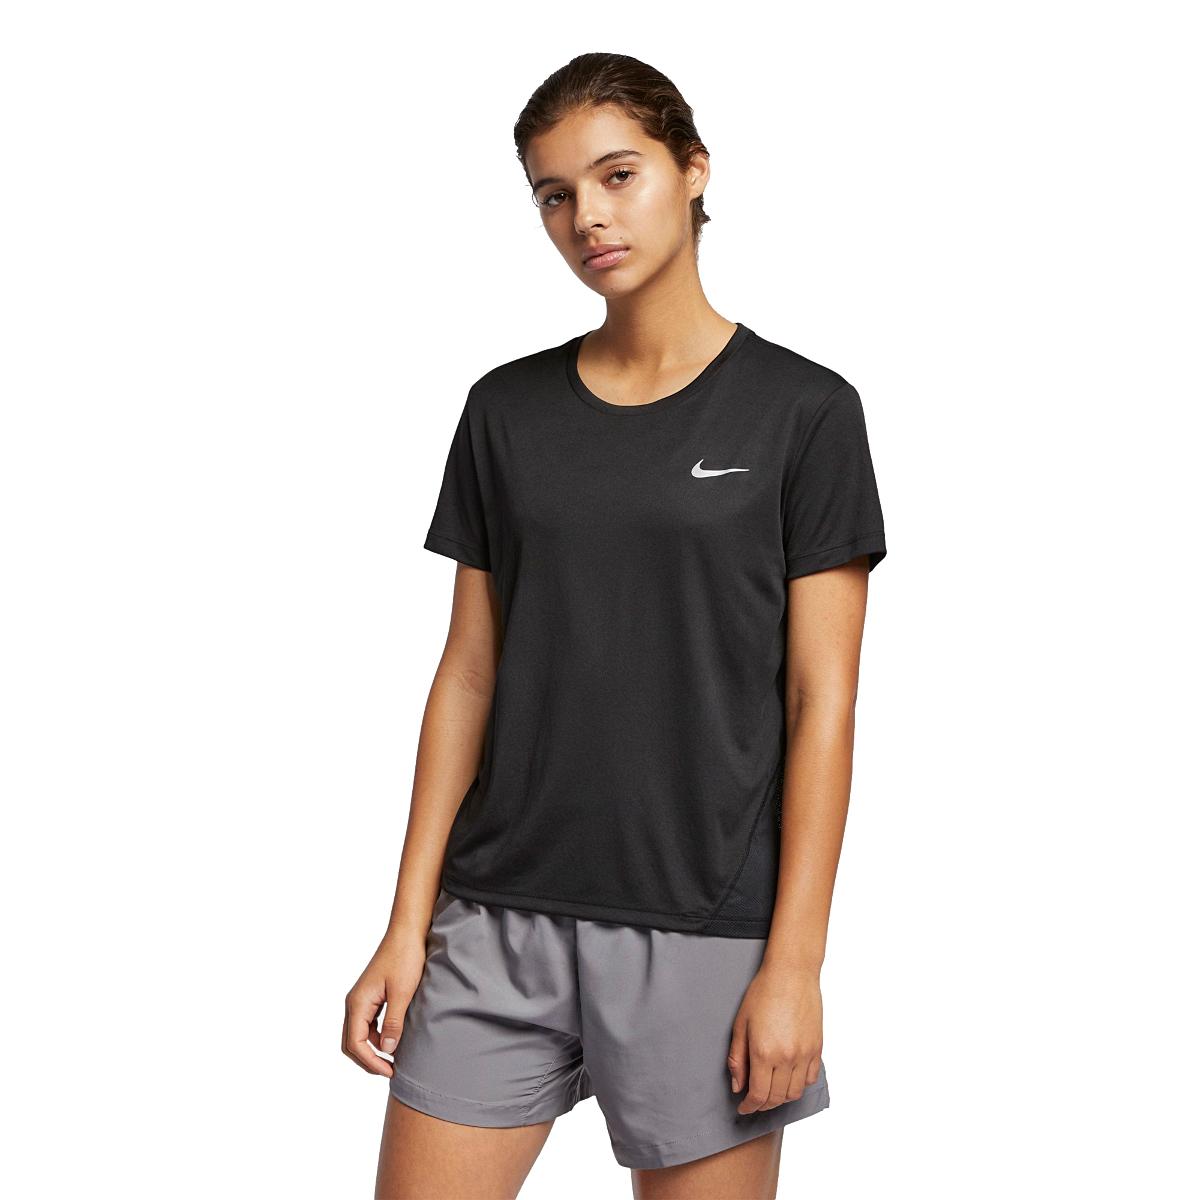 Women's Nike Miler Short Sleeve - Color: Black - Size: XS - Width:, Black, large, image 1